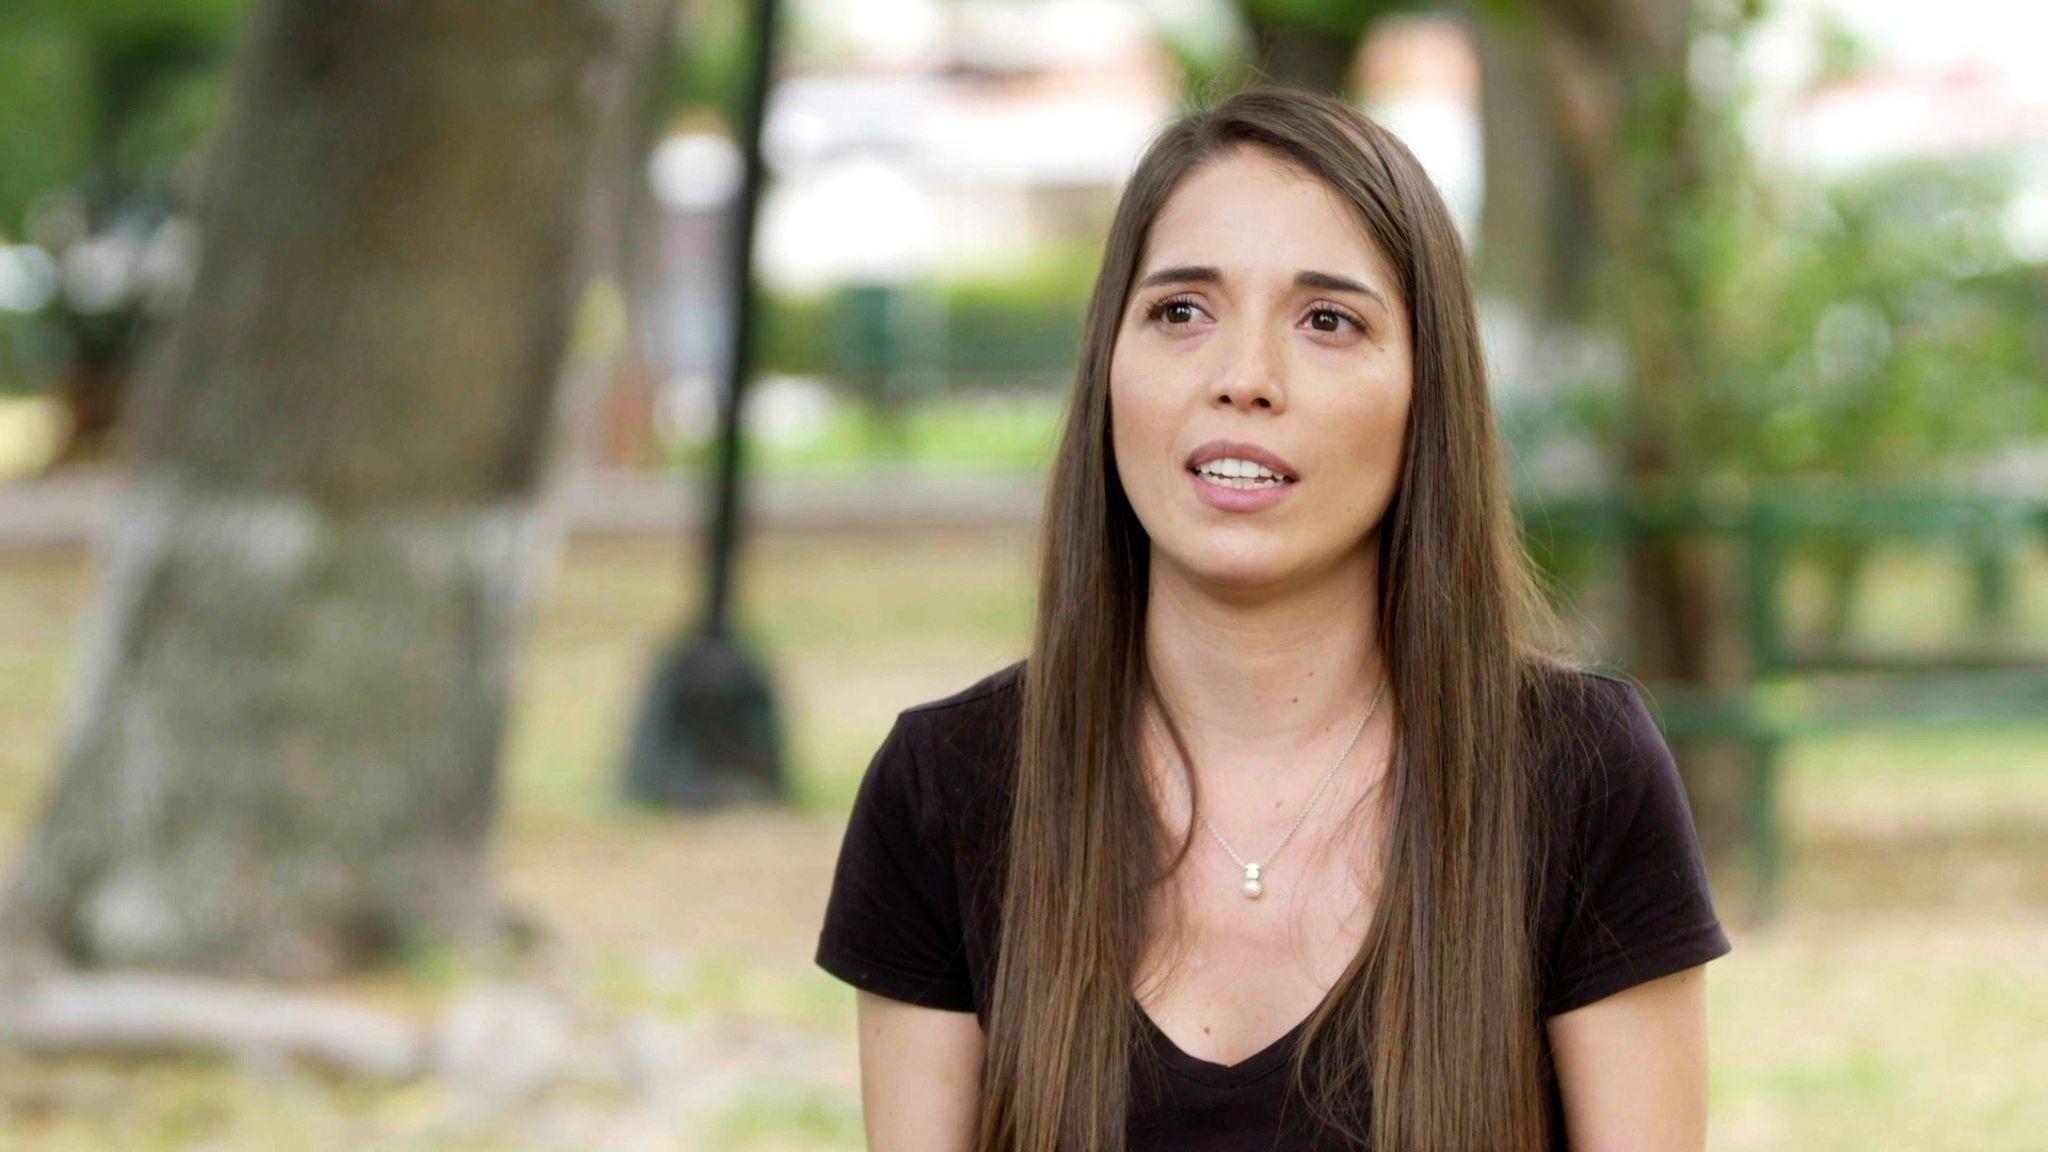 Alondra Torres